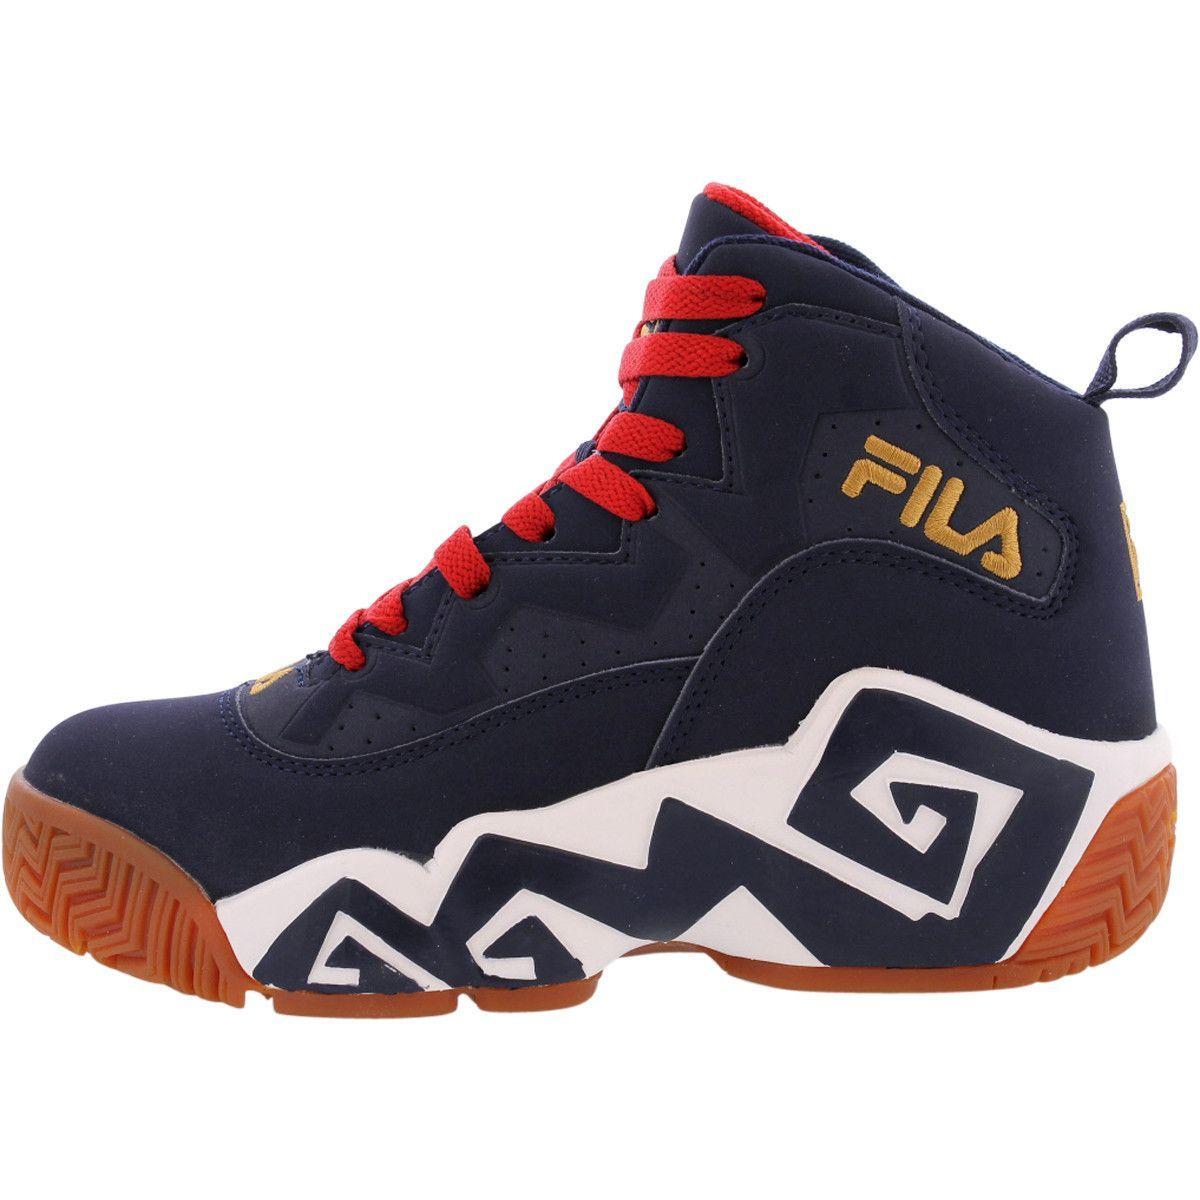 417f4d7cef10 Fila - Boy s Mashburn Mid Sneakers - Navy Red Boy Shoes